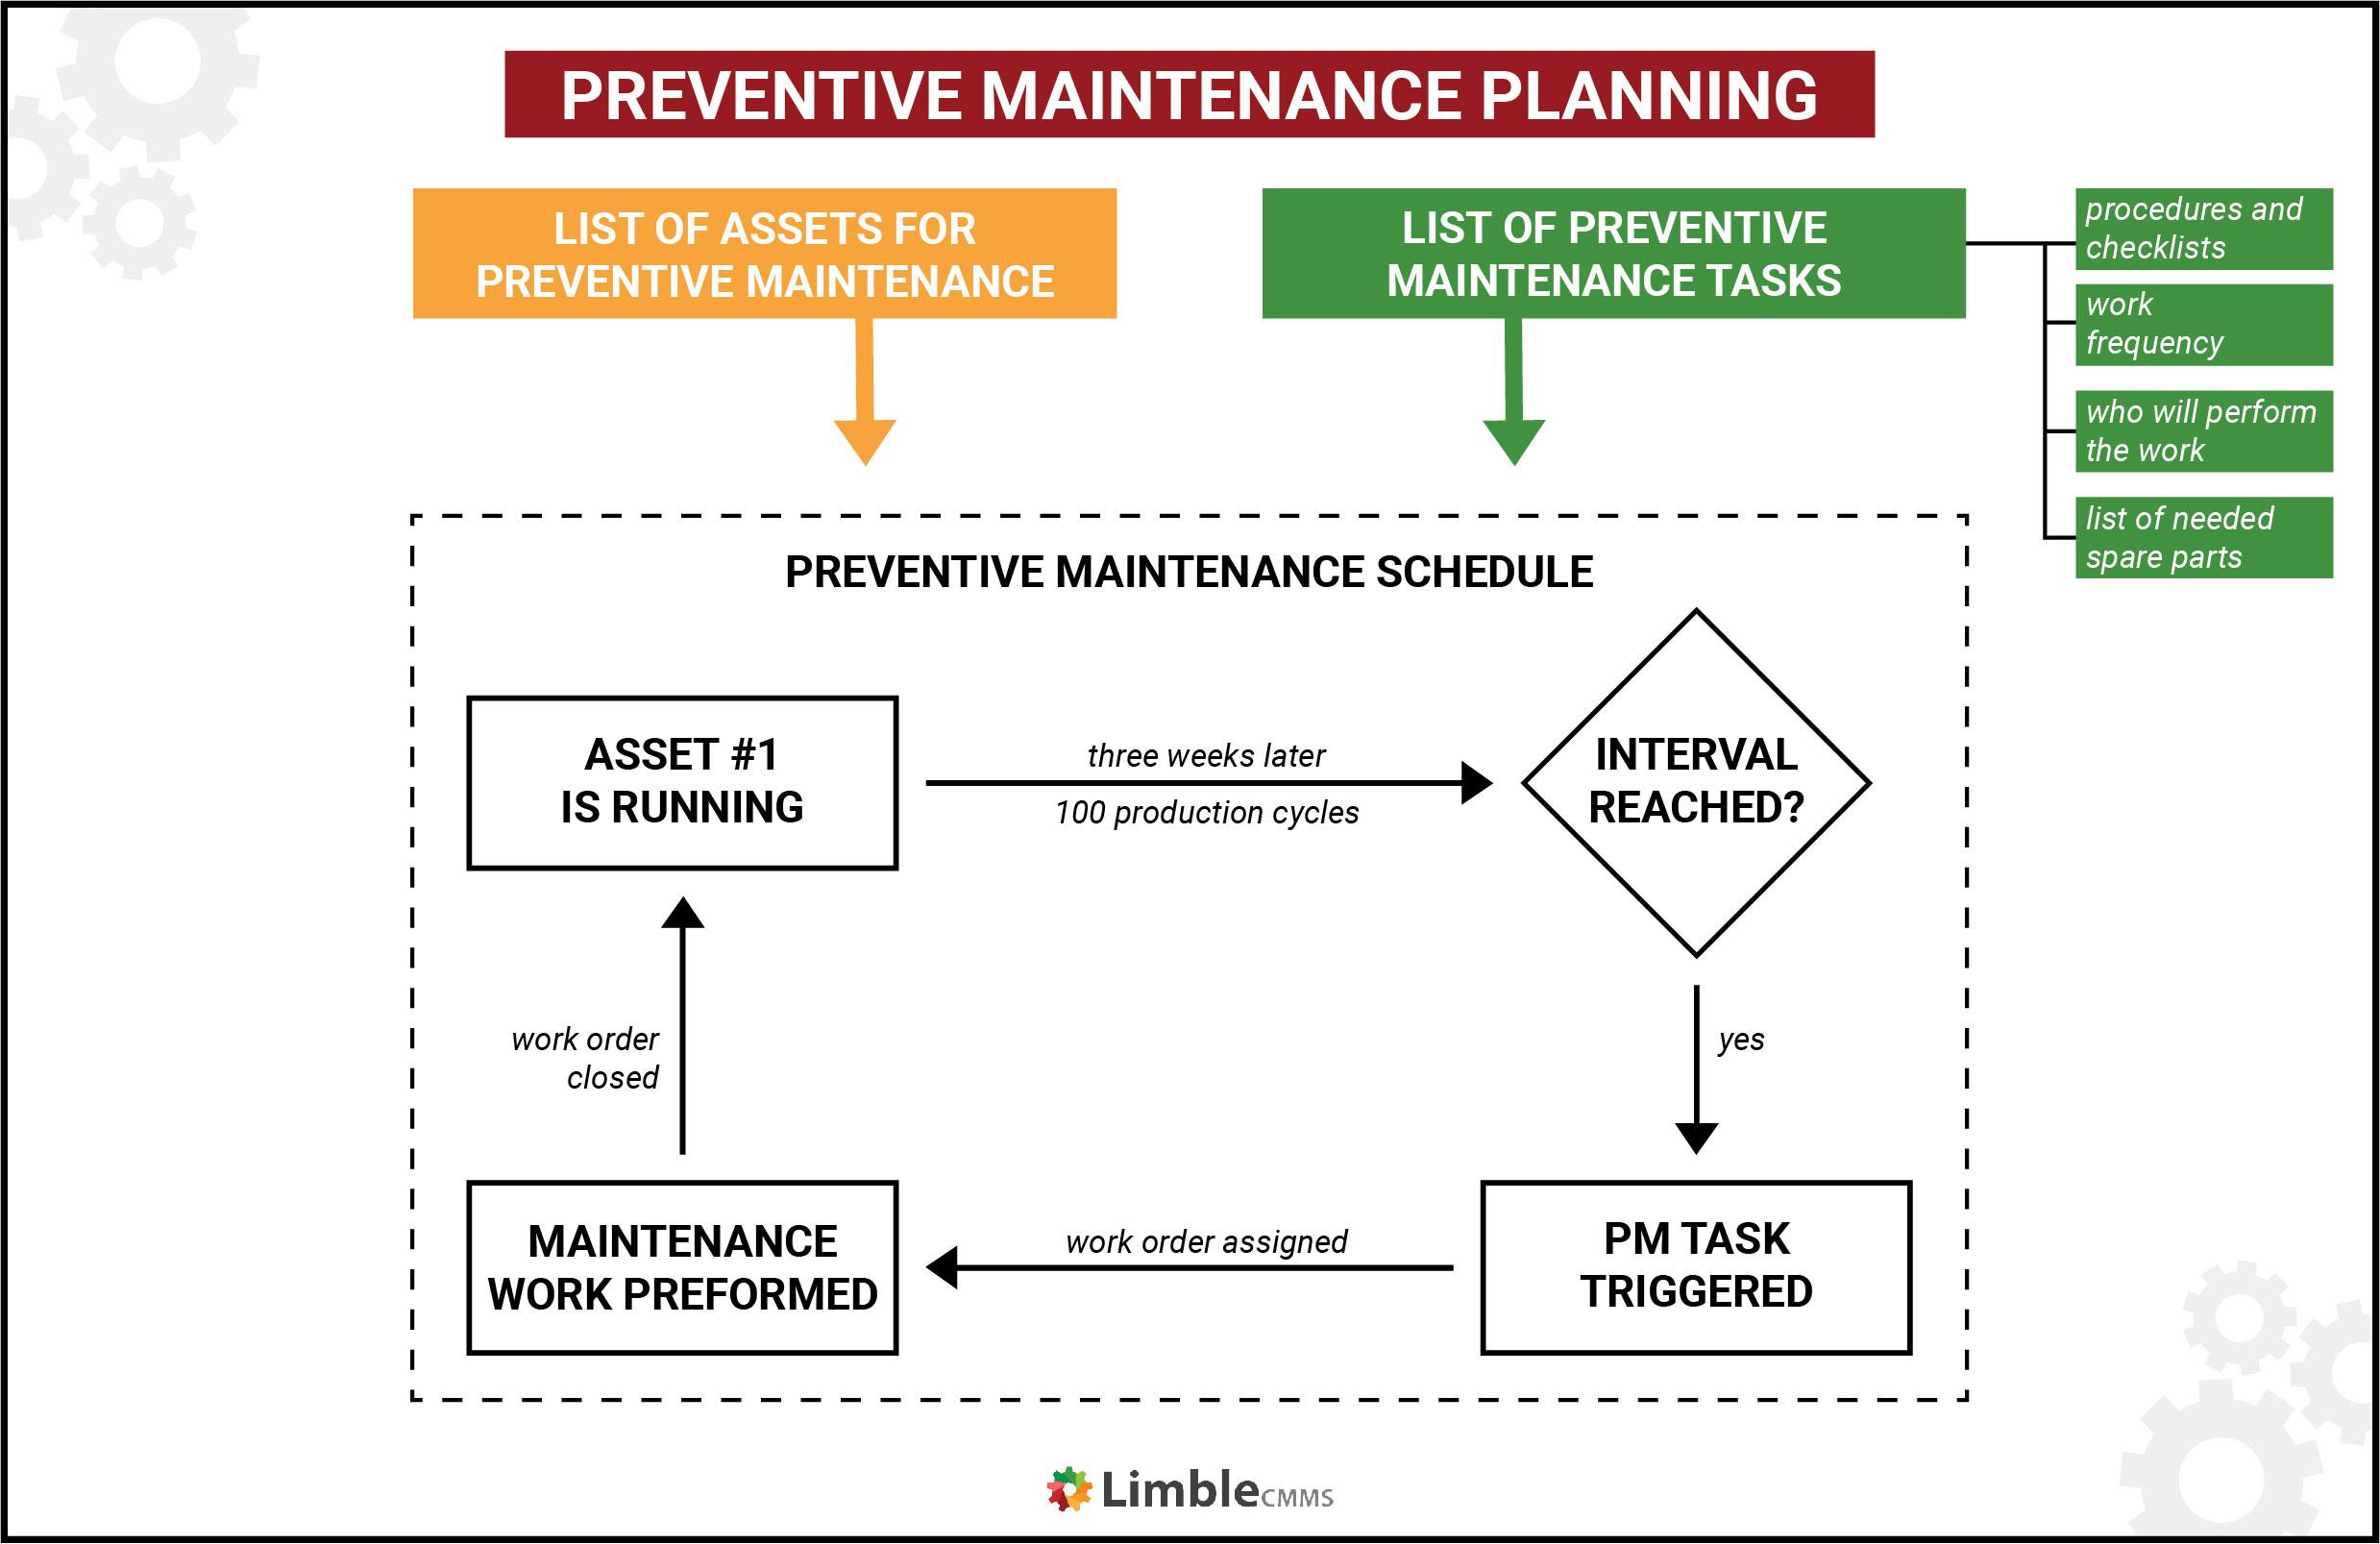 preventive maintenance planning process